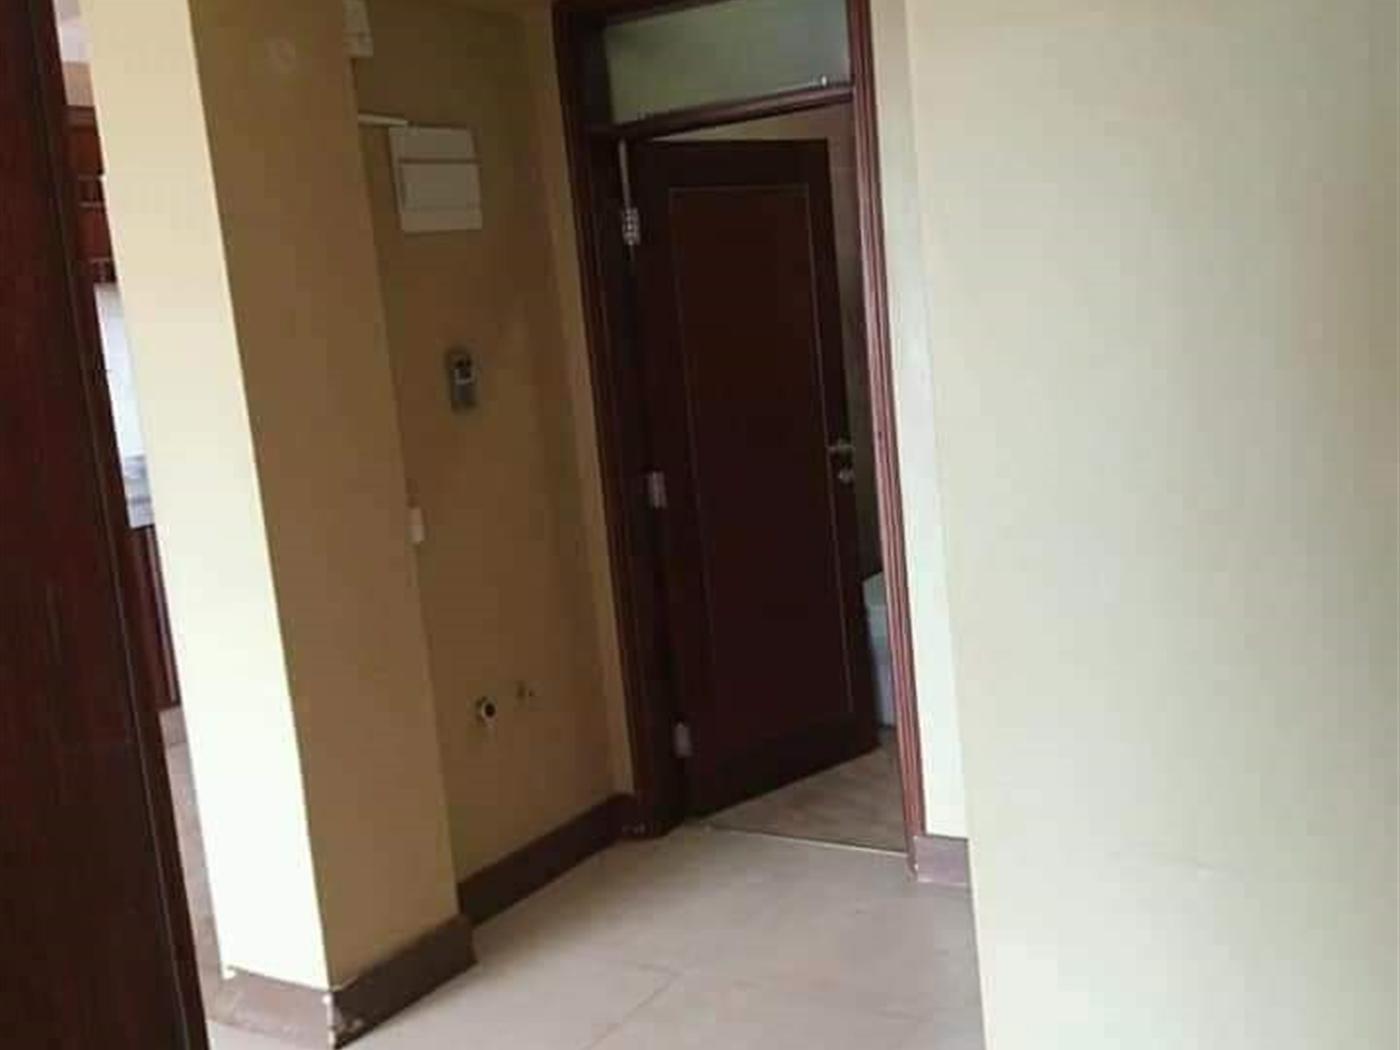 Apartment for rent in Kibuli Kampala